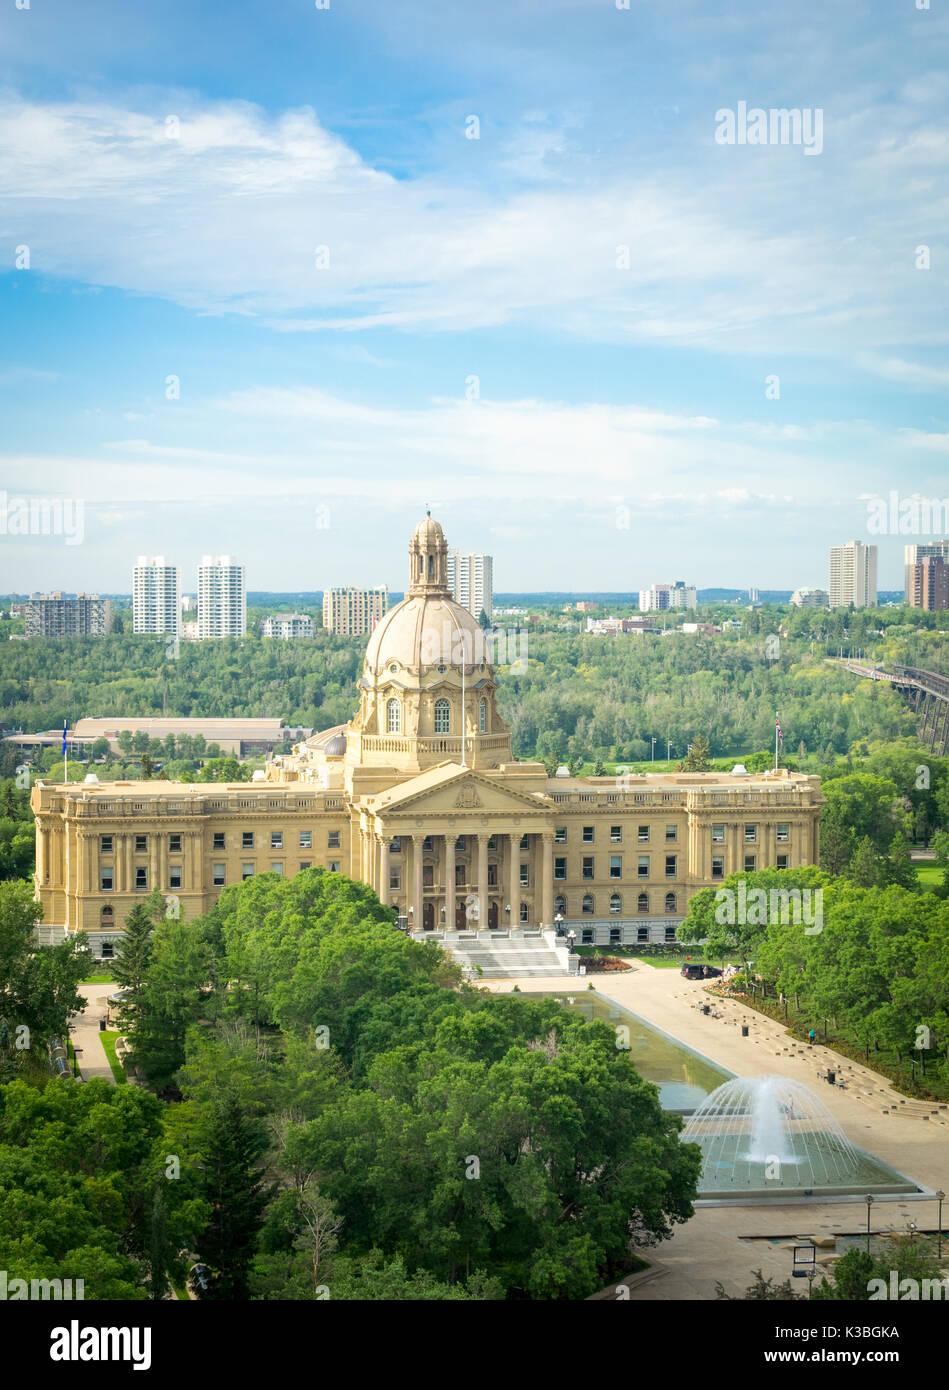 An aerial view of the Alberta Legislature Building, Alberta Legislature Grounds and High Level Bridge in Edmonton, - Stock Image